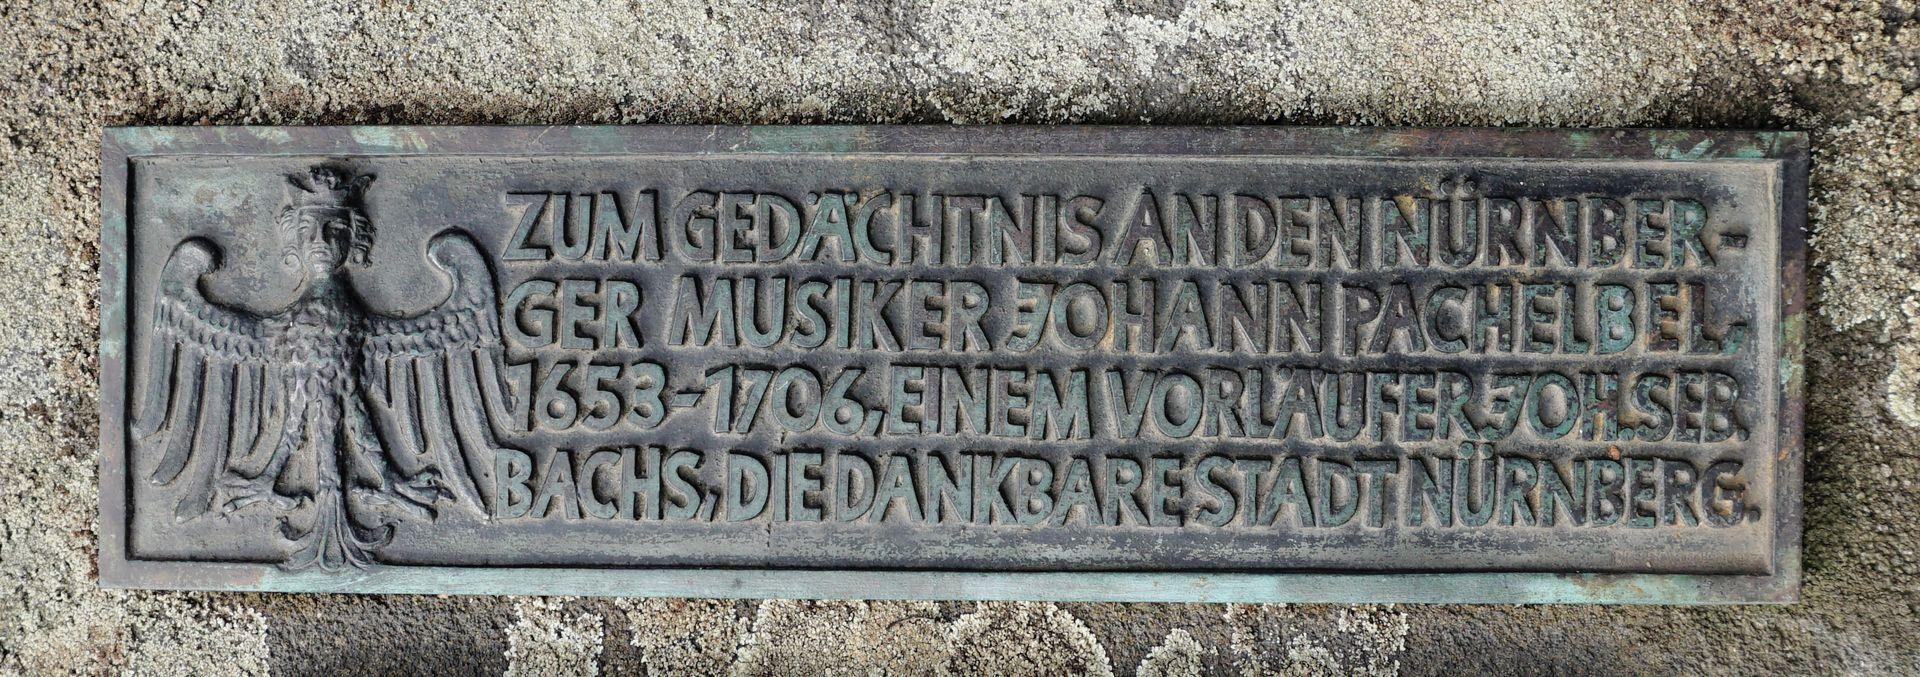 Johann Pachelbel Grabstätte Erinnerungstafel